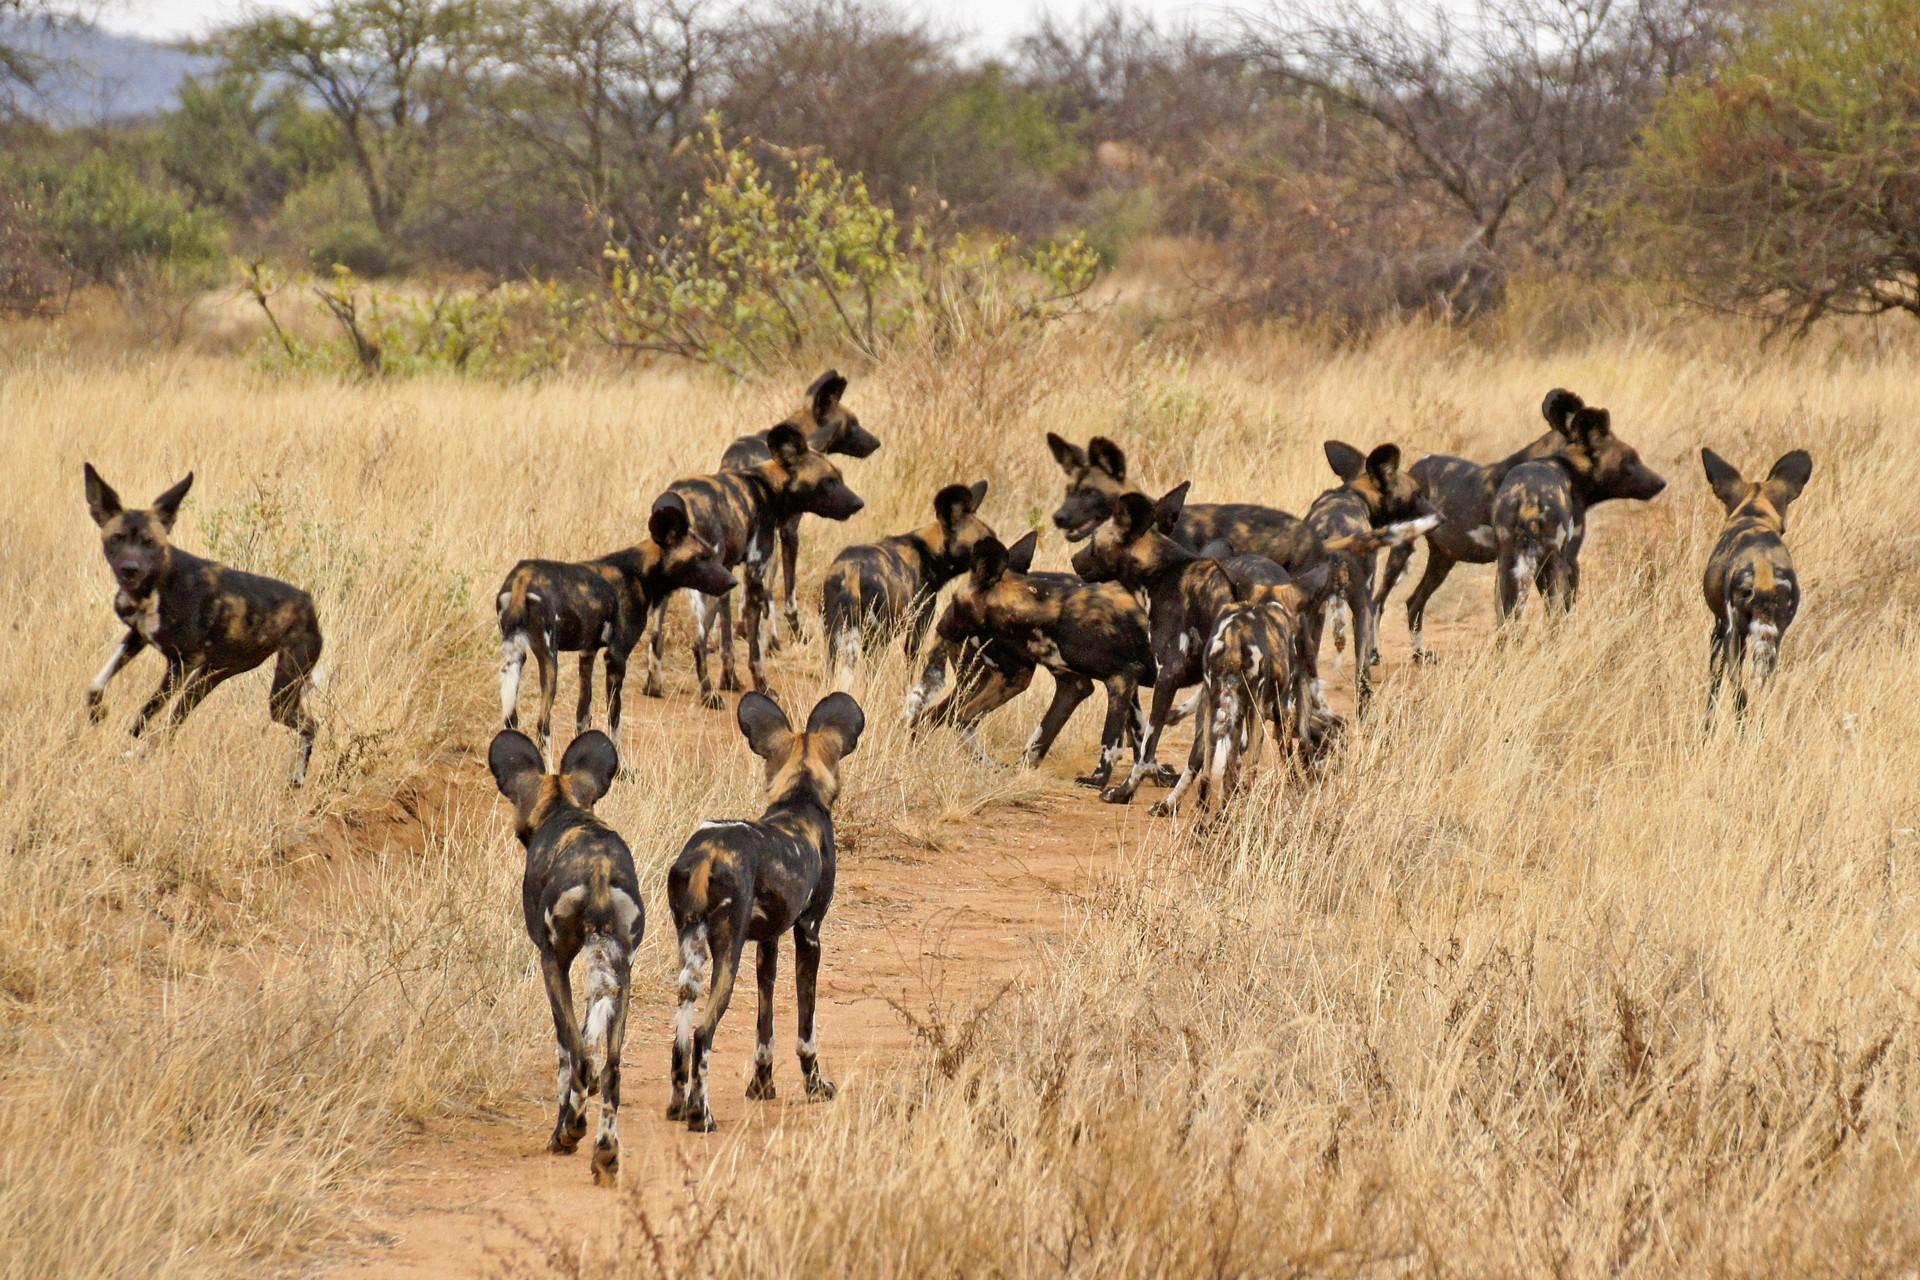 African wild dog in Kenya